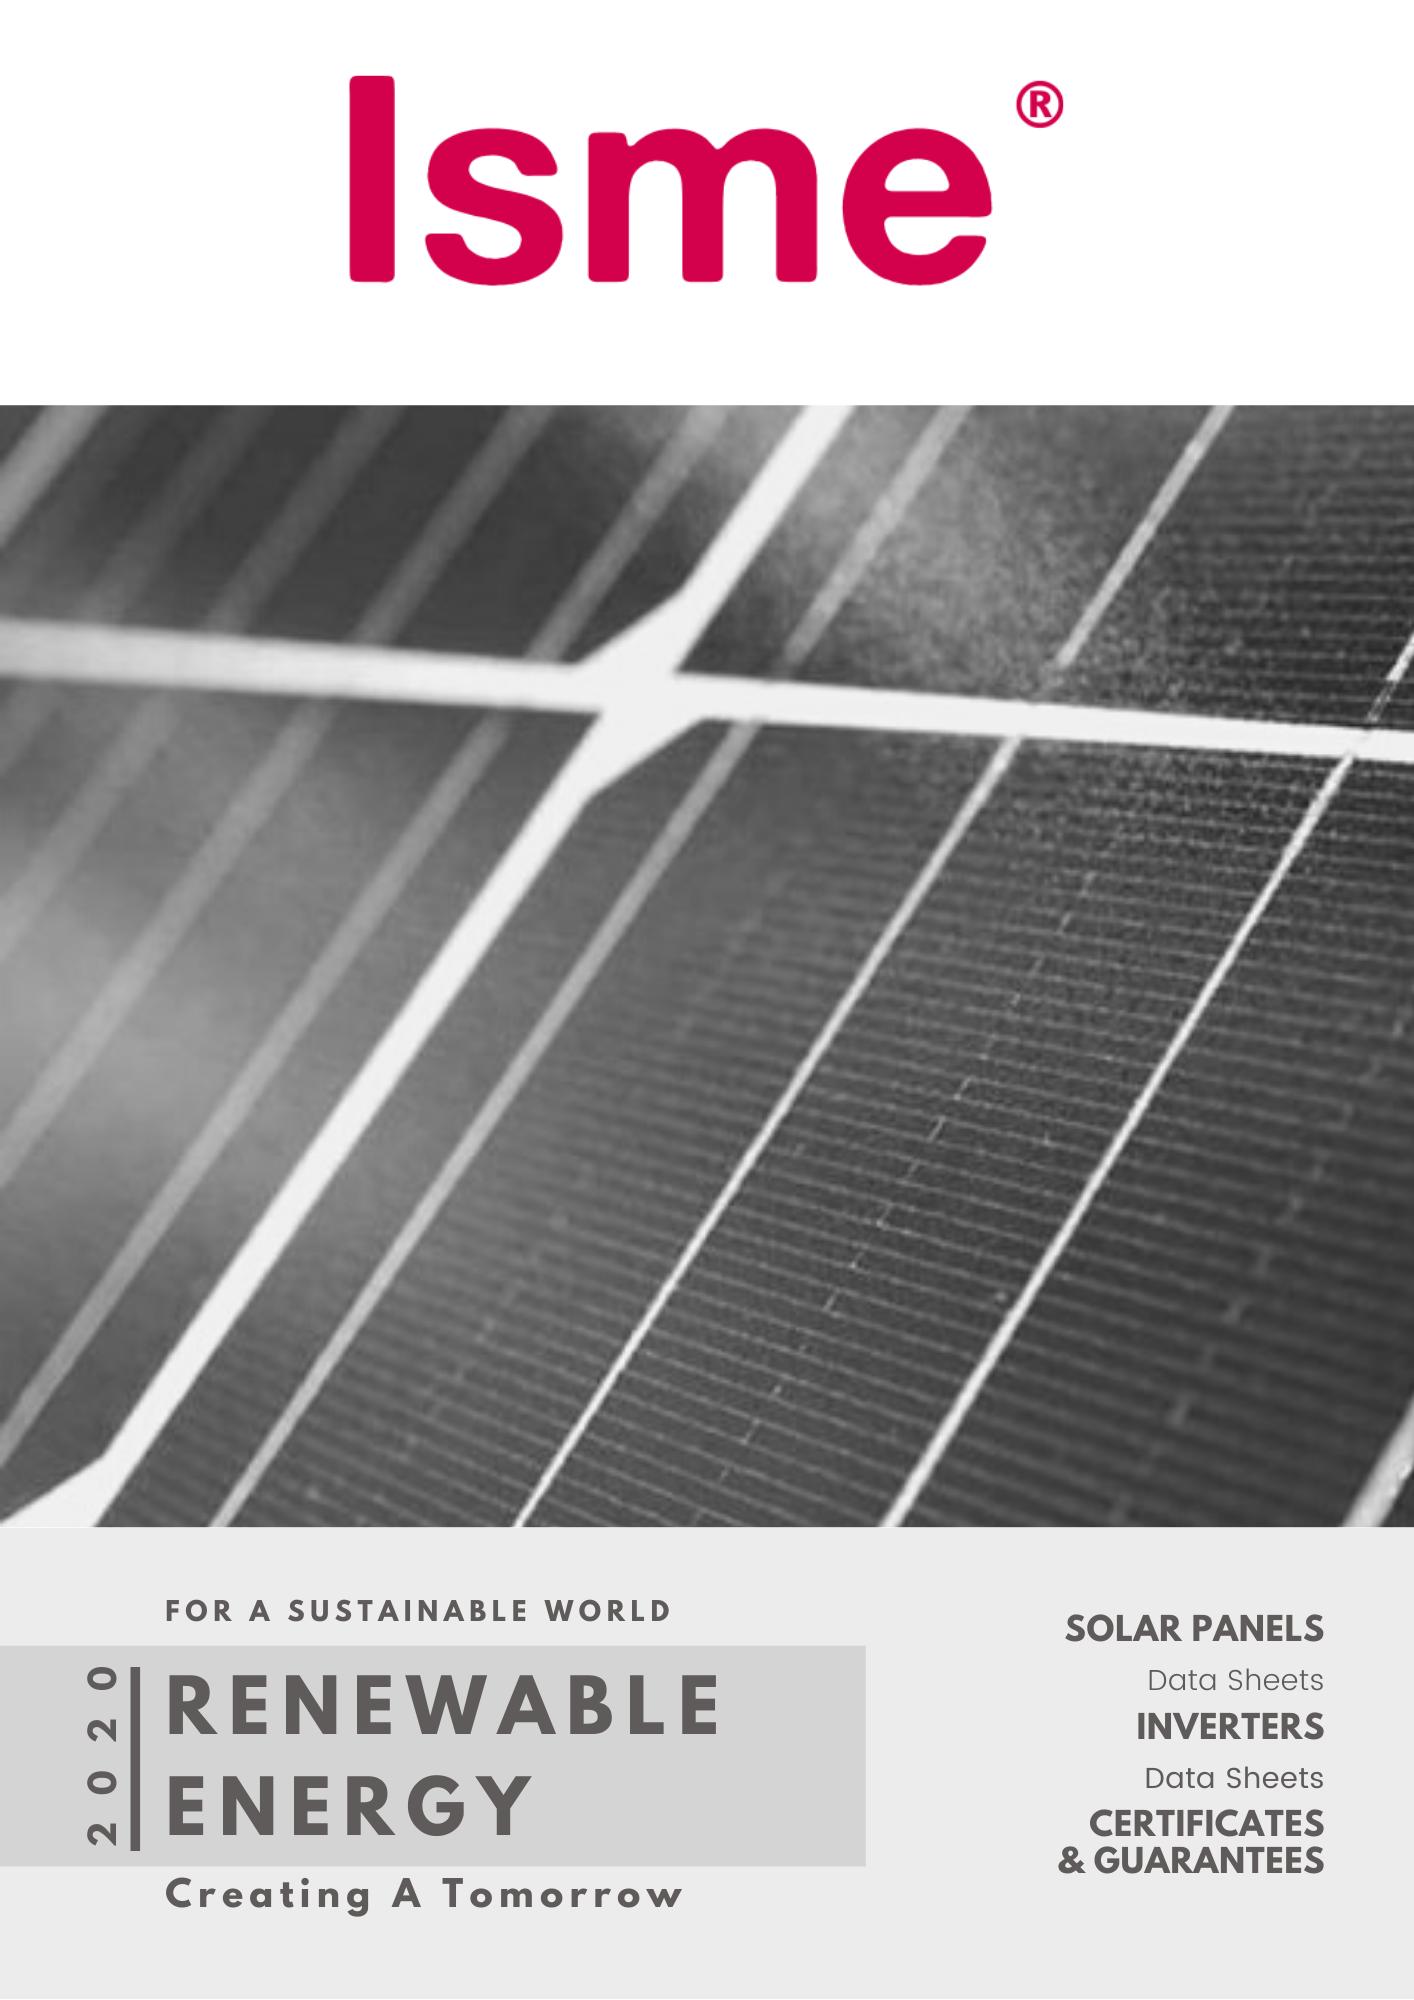 Isme renewable energy